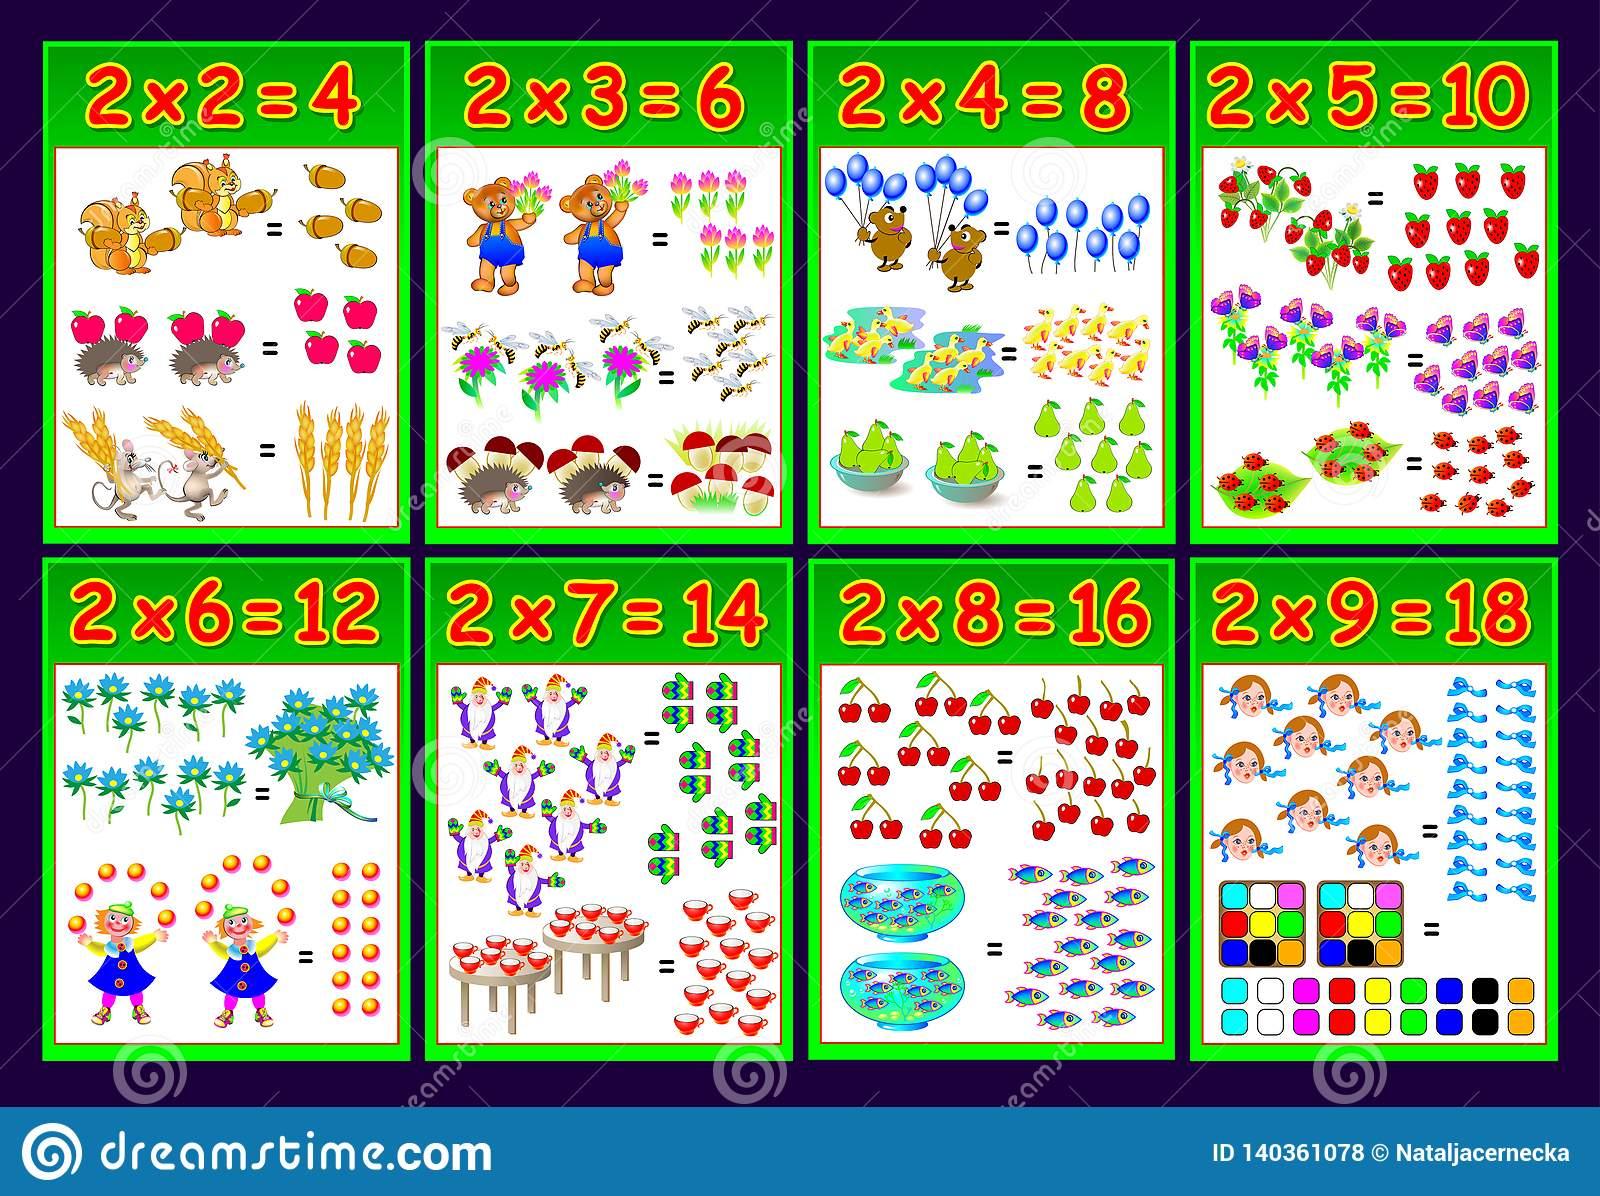 Worksheet Multiplication 2 Xs | Printable Worksheets And within Printable Multiplication Poster